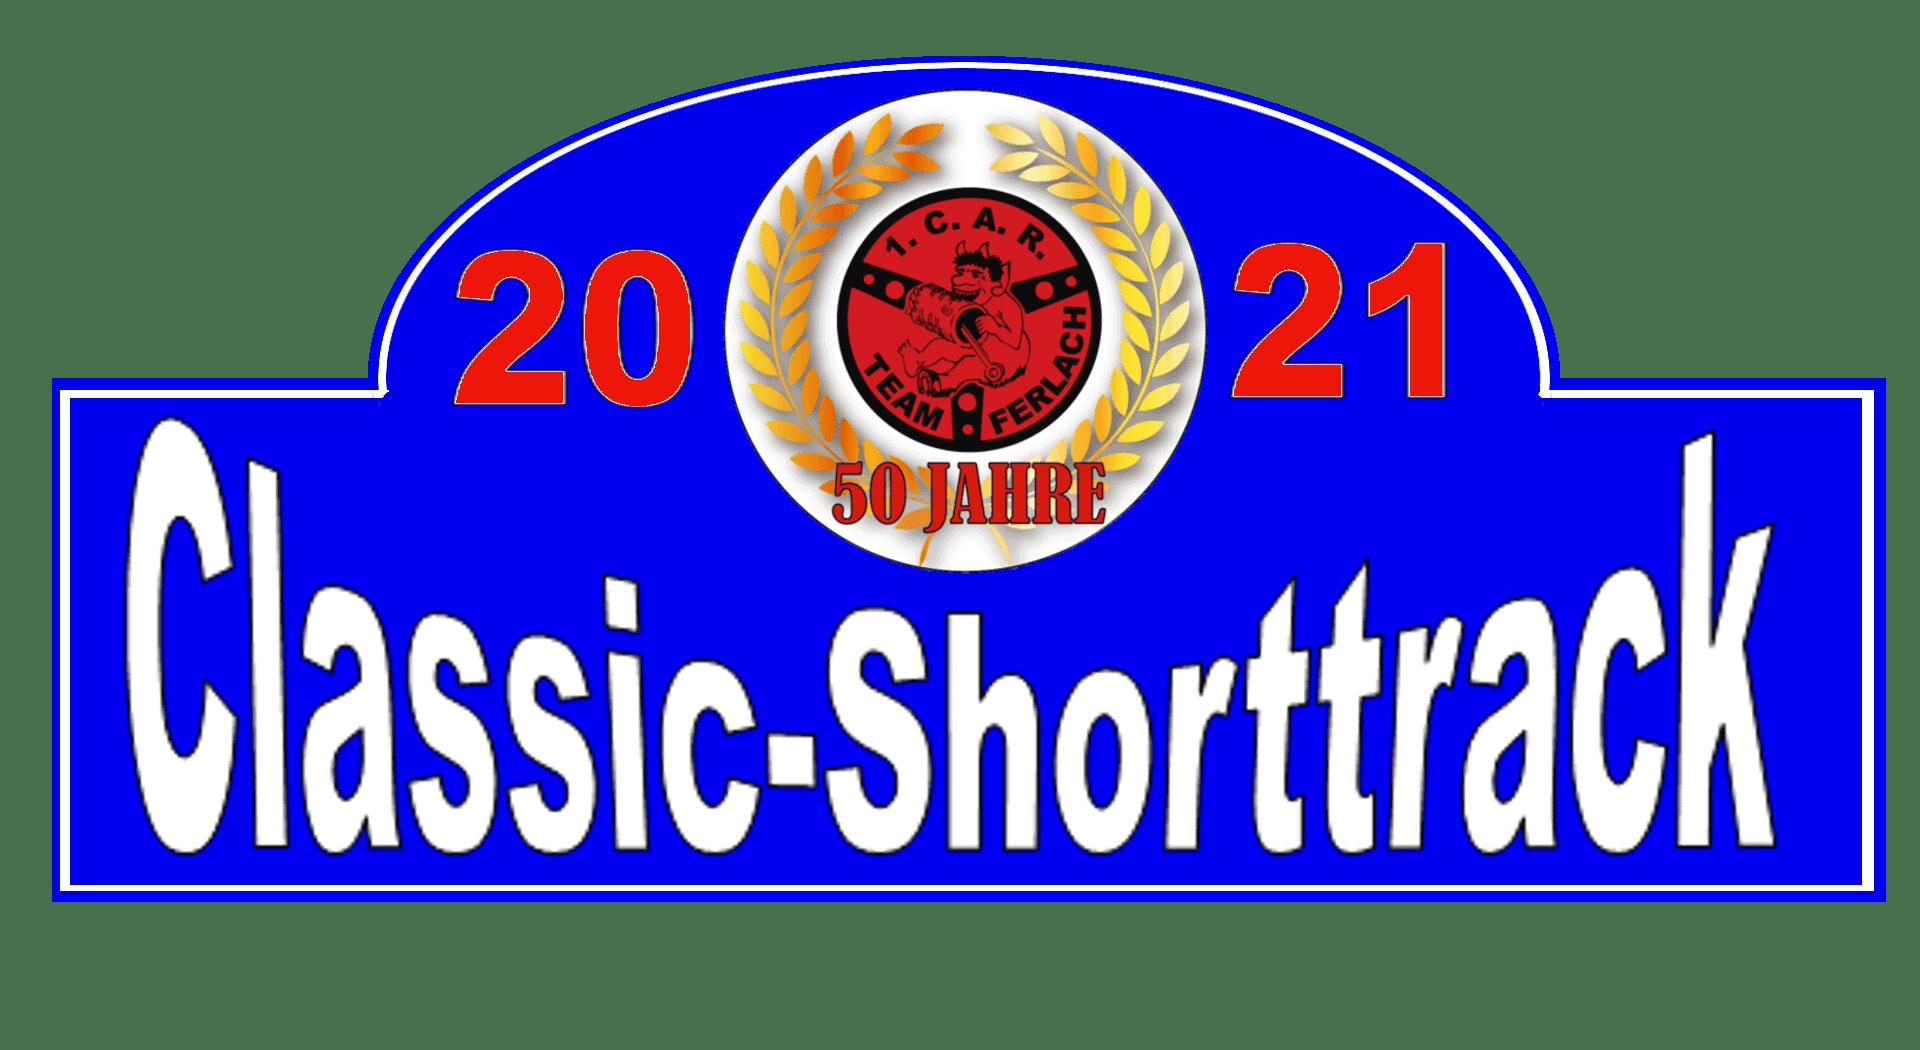 2021 Classic Shorttrack Logo 1920x1050 Web